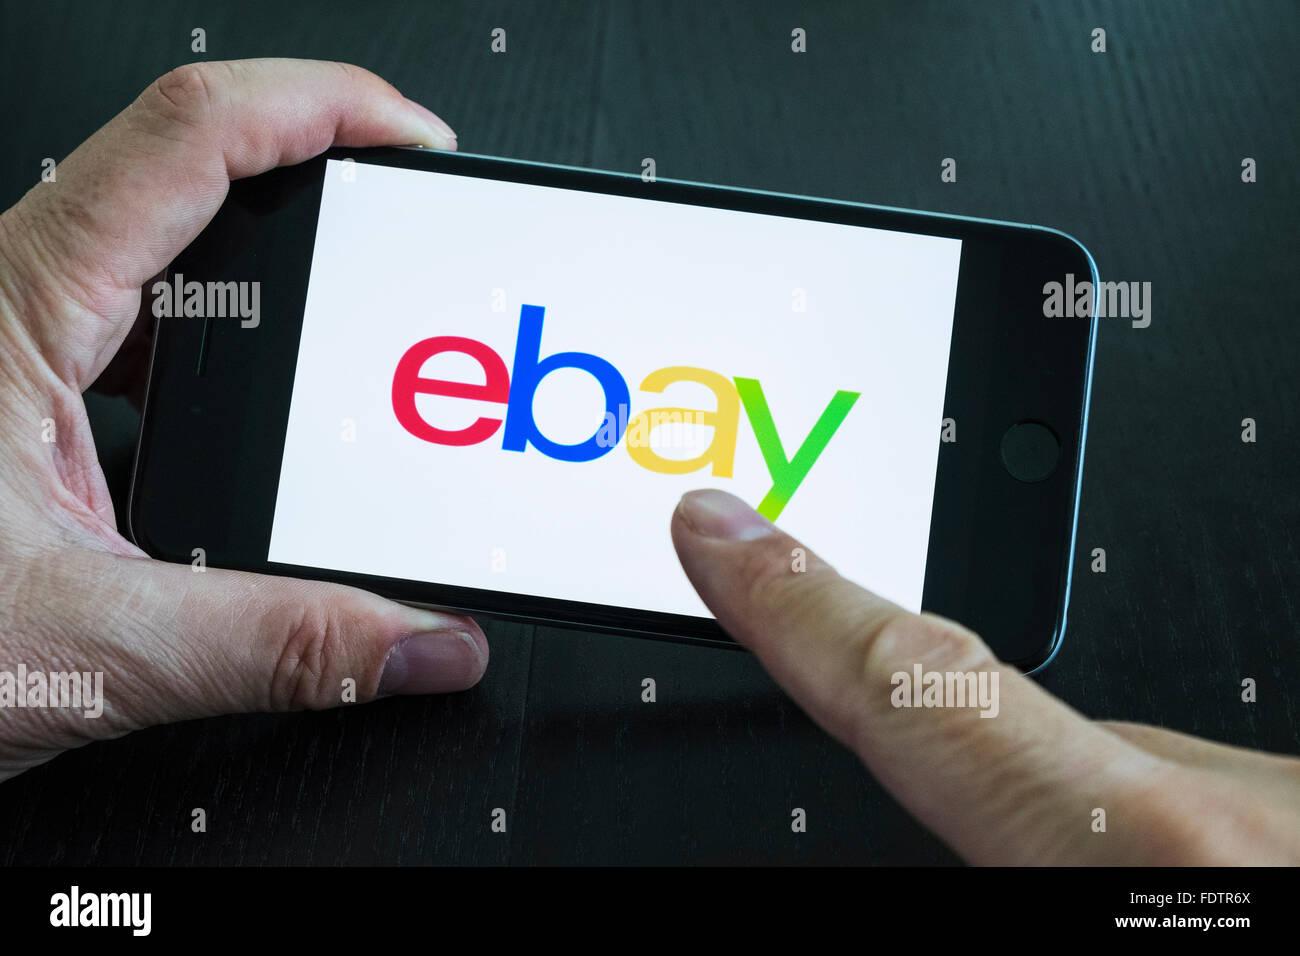 eBay online auction app logo on screen of smart phone Stock Photo